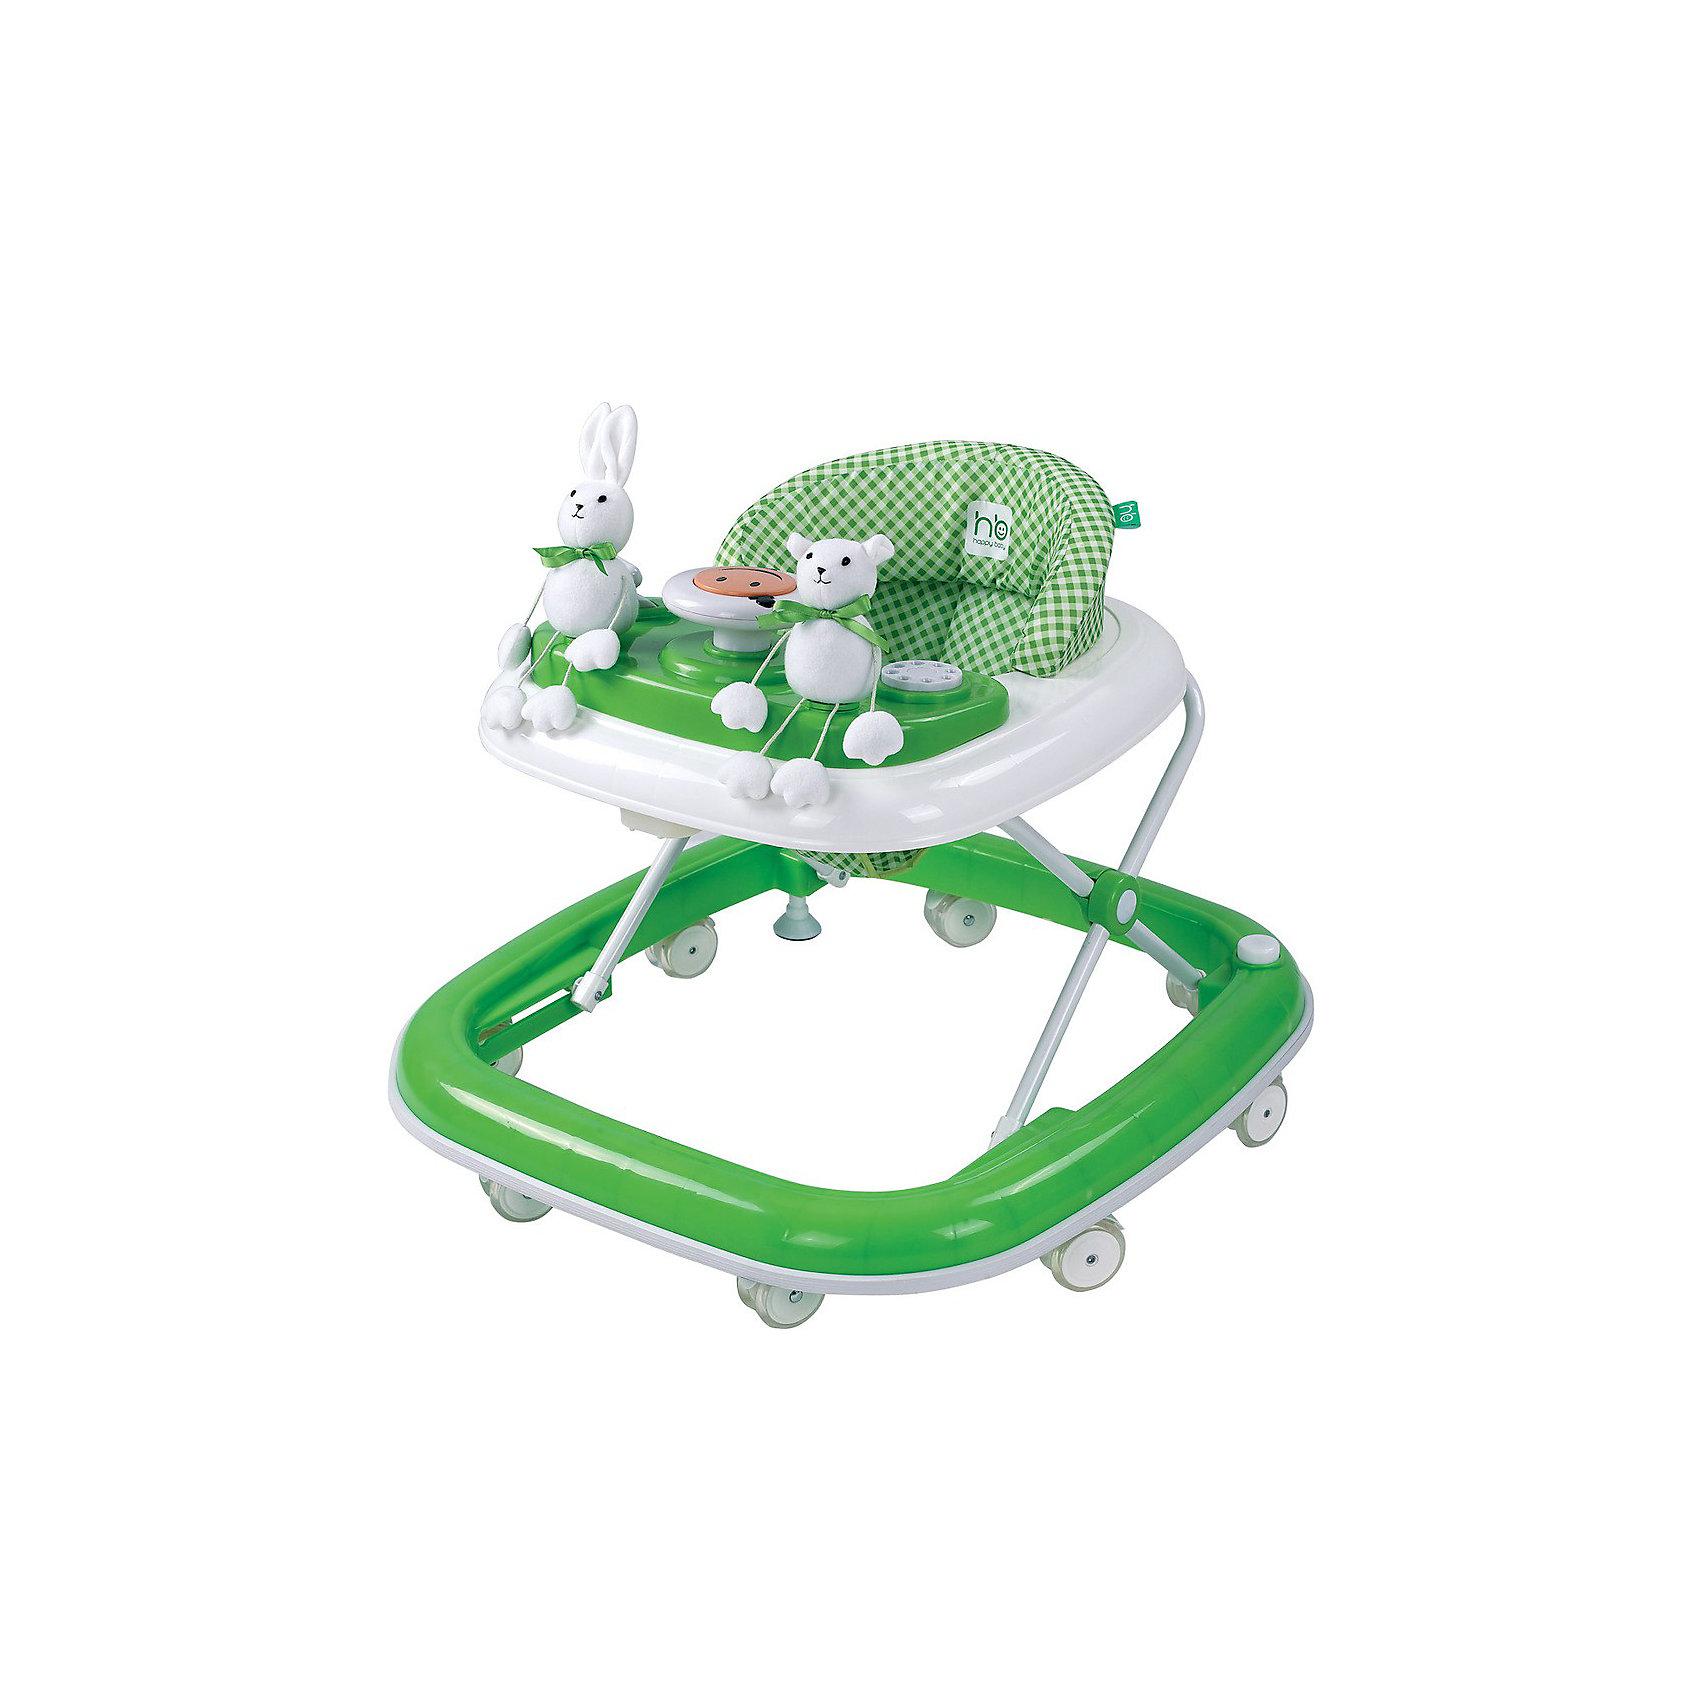 Ходунки Smiley, Happy Baby, зеленый